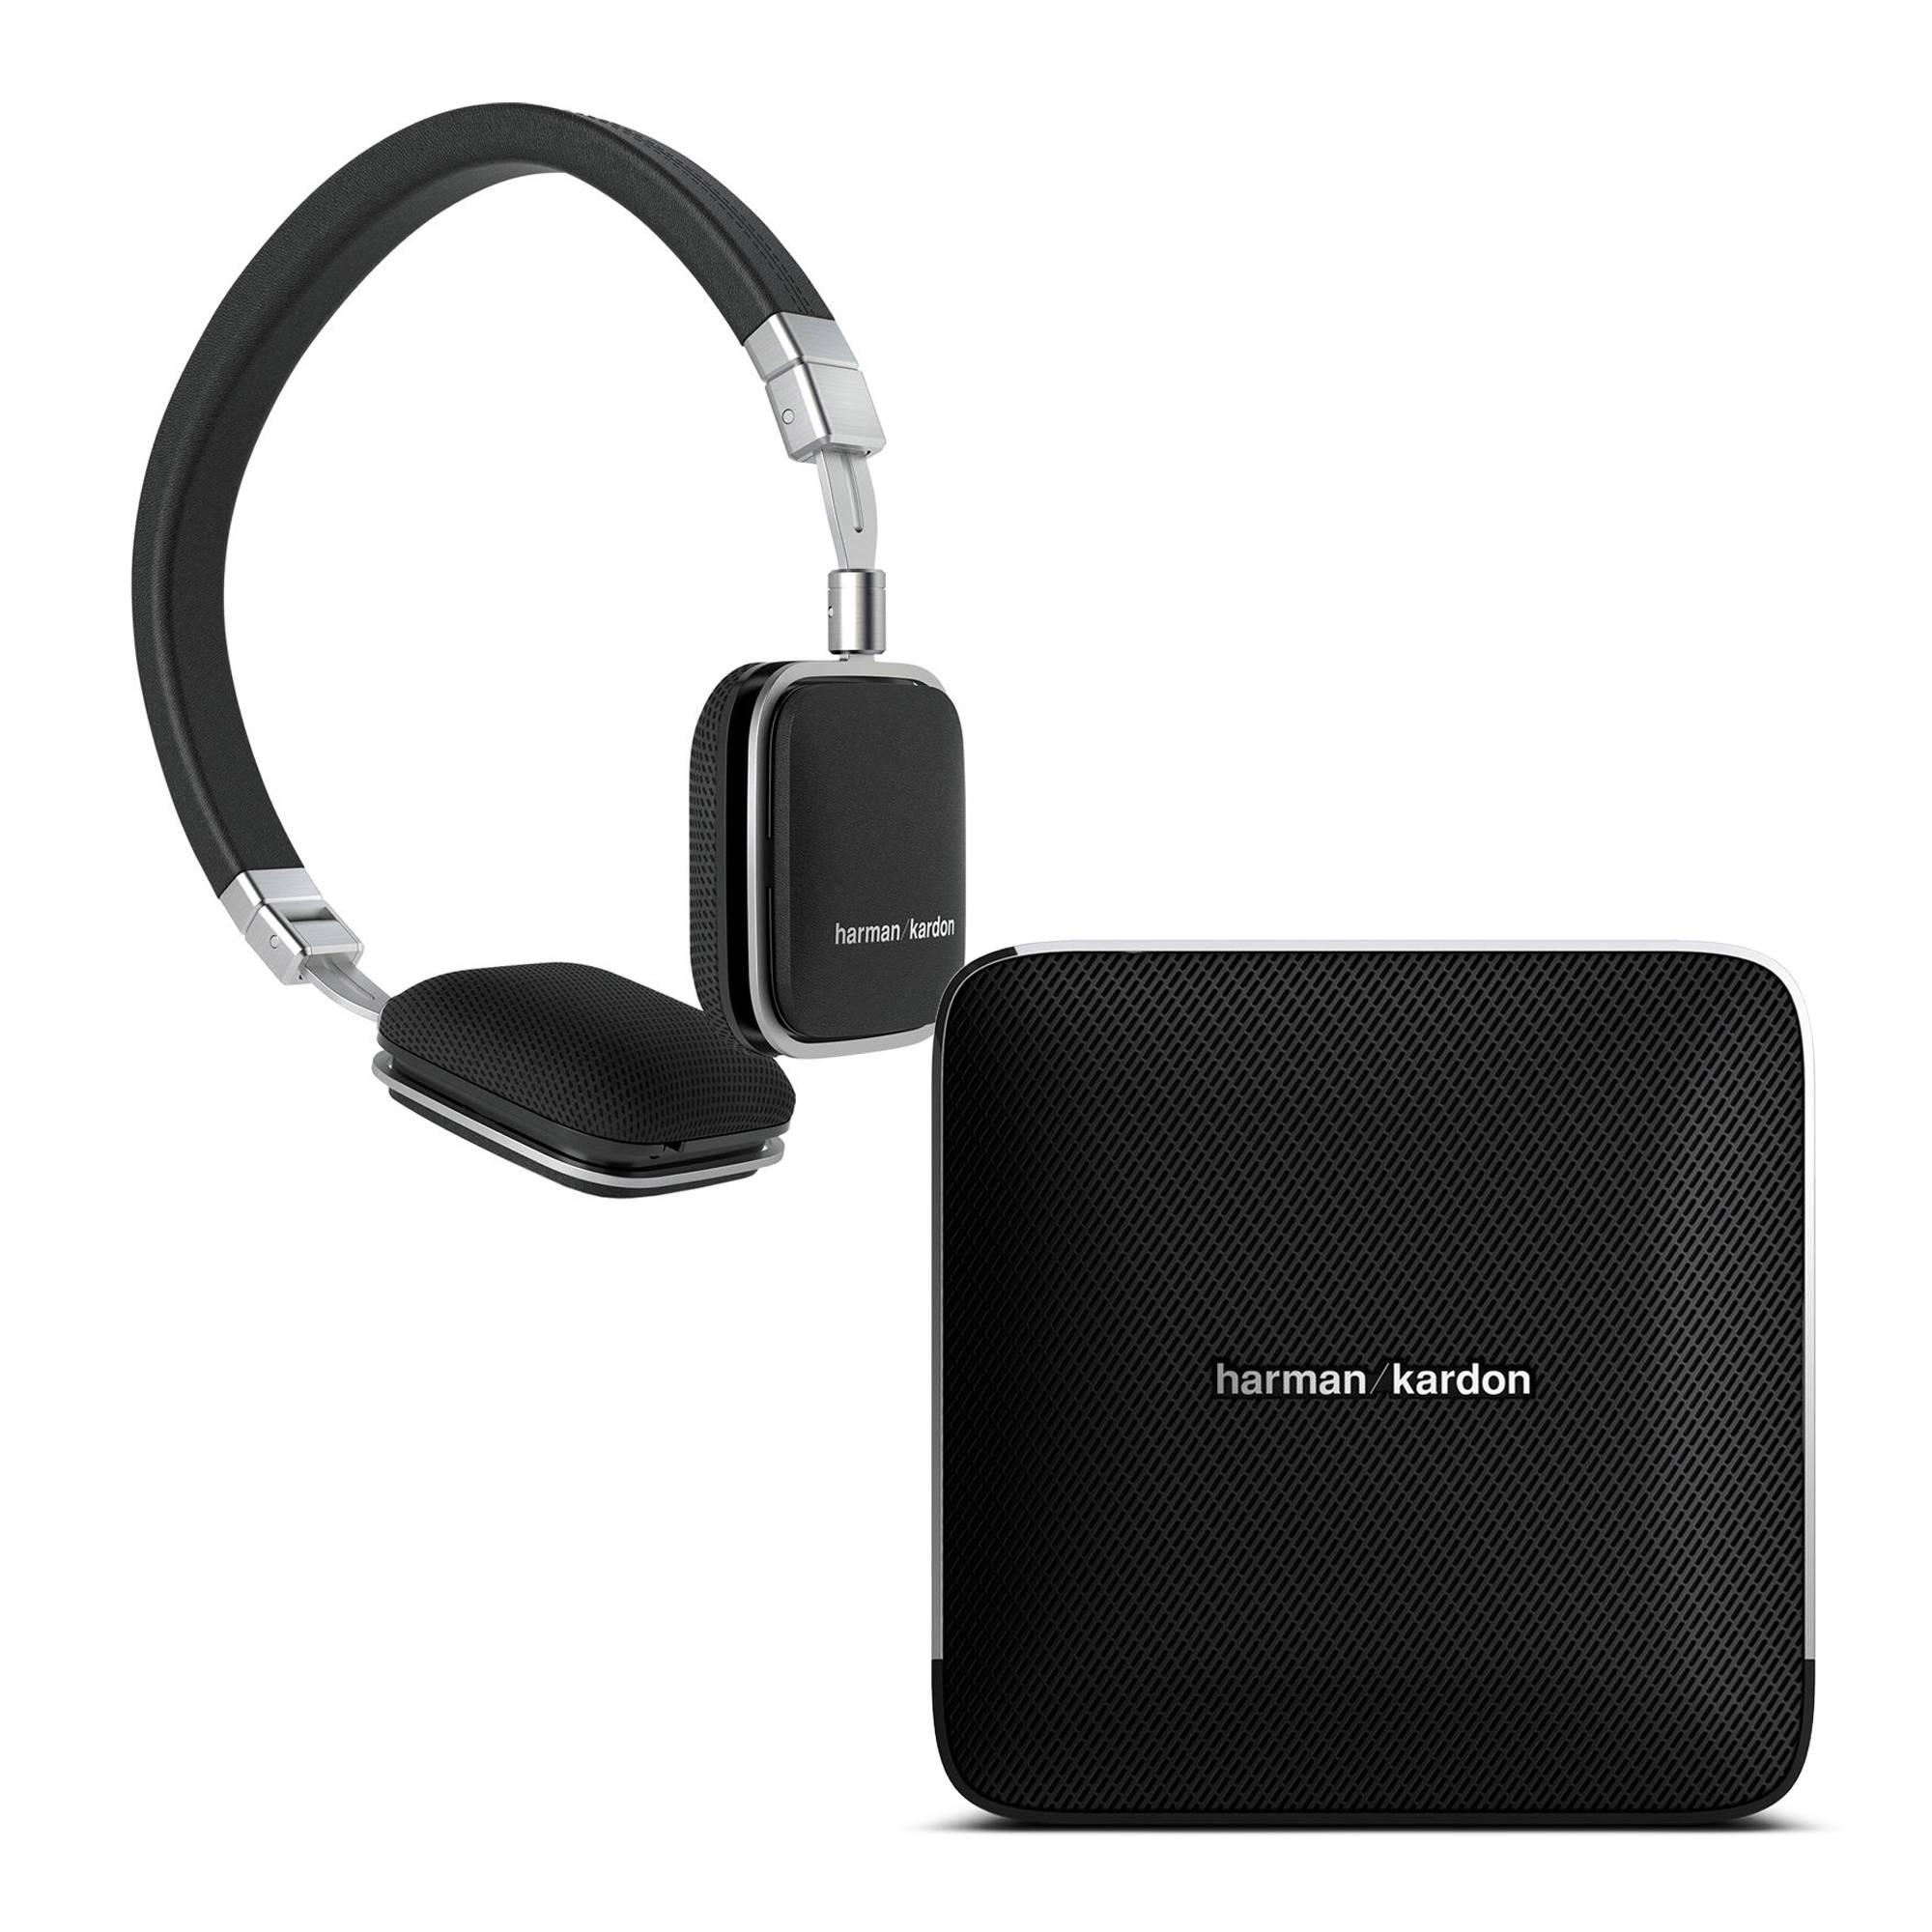 d633325471c Harman Kardon Esquire Wireless Speaker and Soho Android Headphones Kit ( Black, Black)